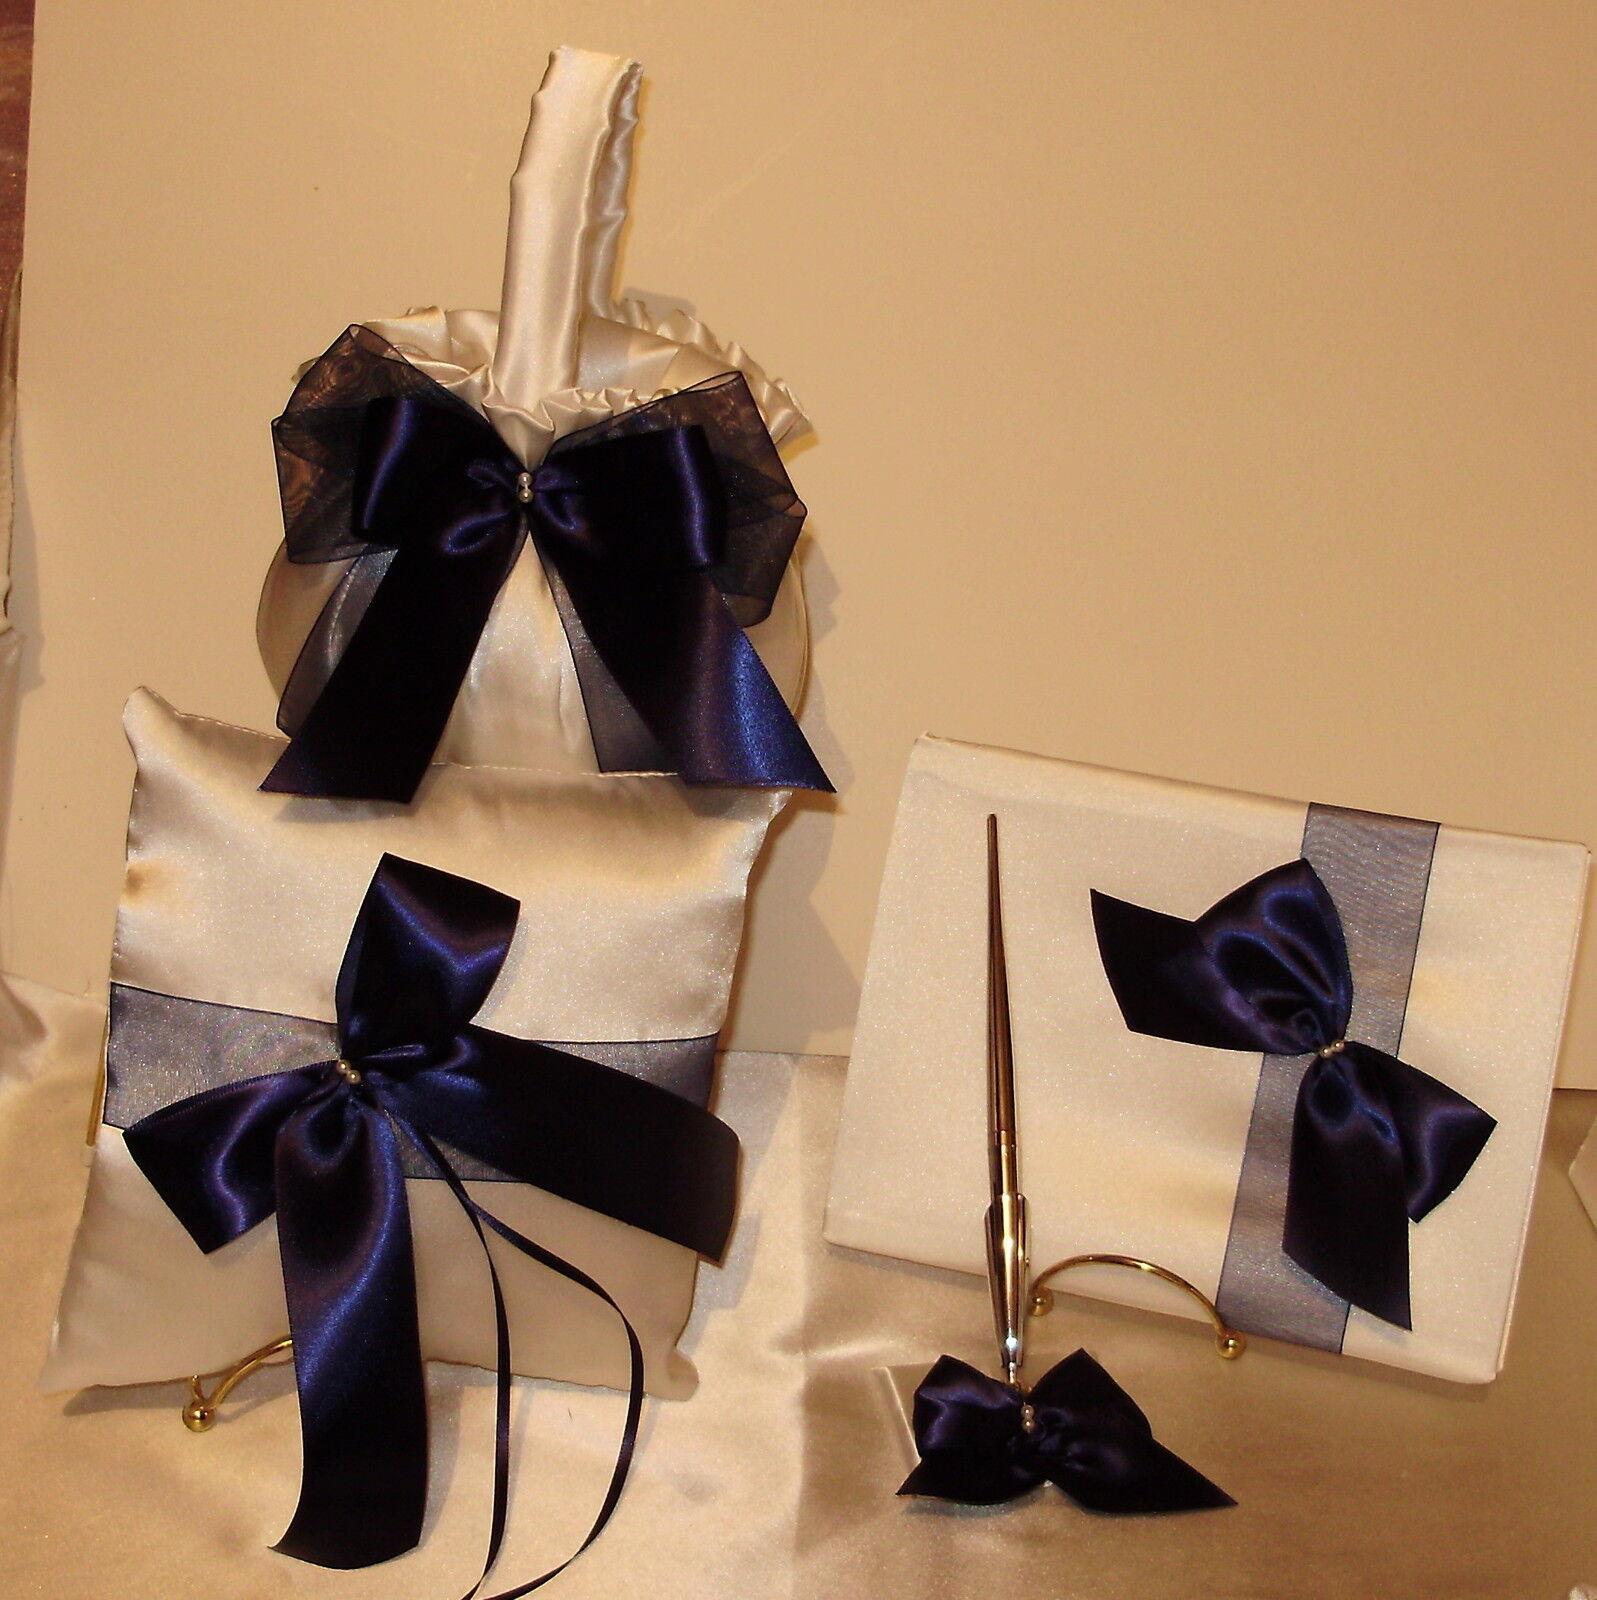 5 PIECE  BRIDAL SET Ring Pillow, 2  Flower Girl  Baskets, Guest Book, and Pen